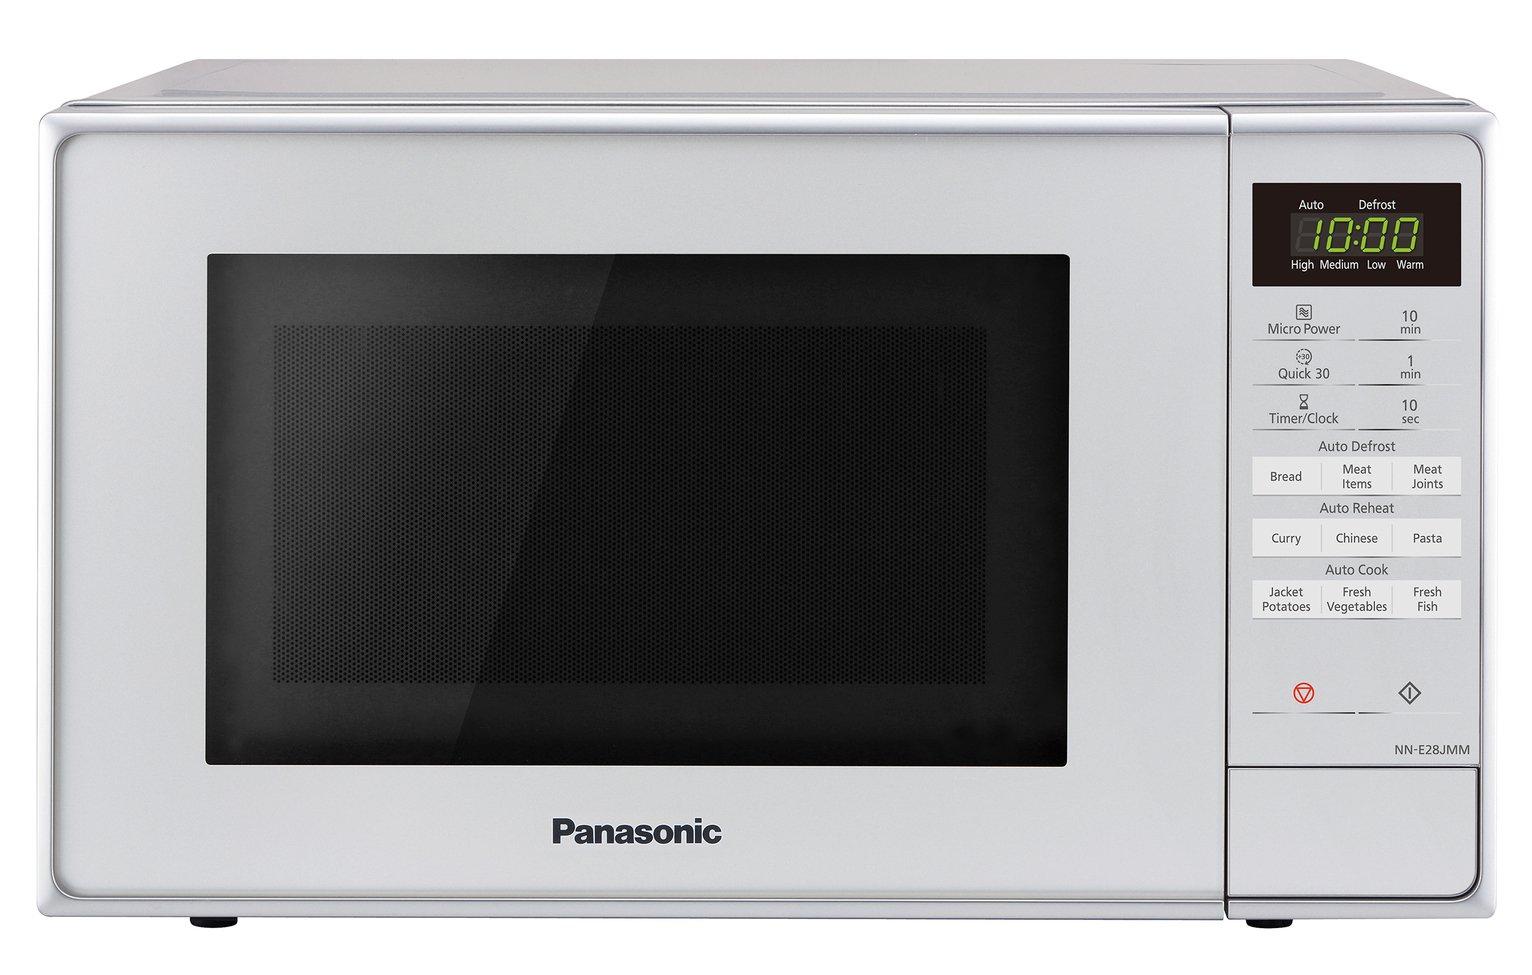 Buy Panasonic 800W Standard 20L Microwave NN-E28JMMBPQ - Silver | Microwaves | Argos